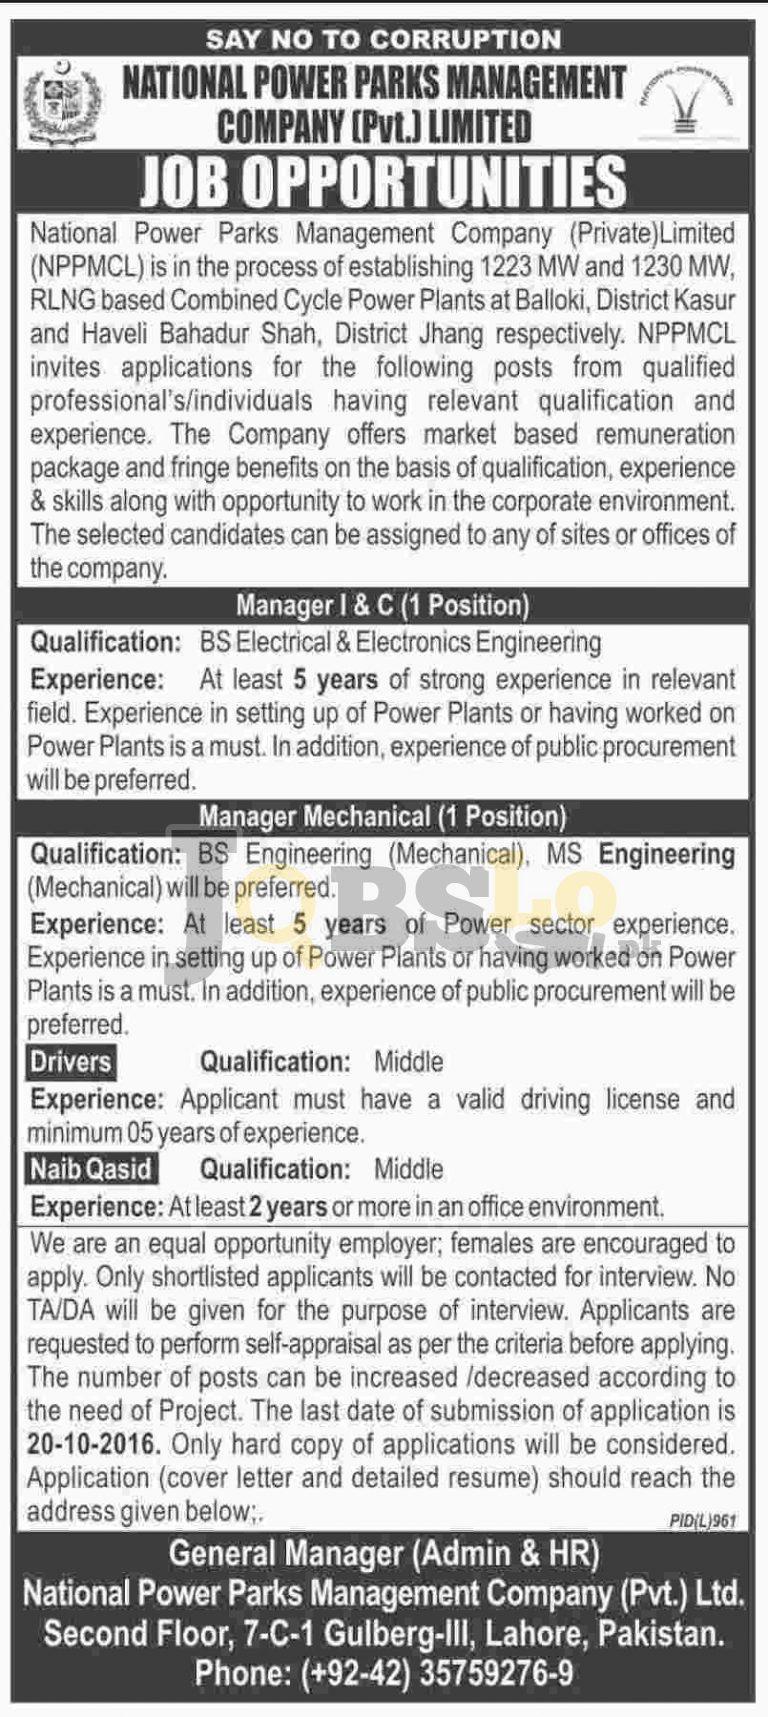 National Power Parks Management Company Lahore Jobs 2016 Advertisement Latest